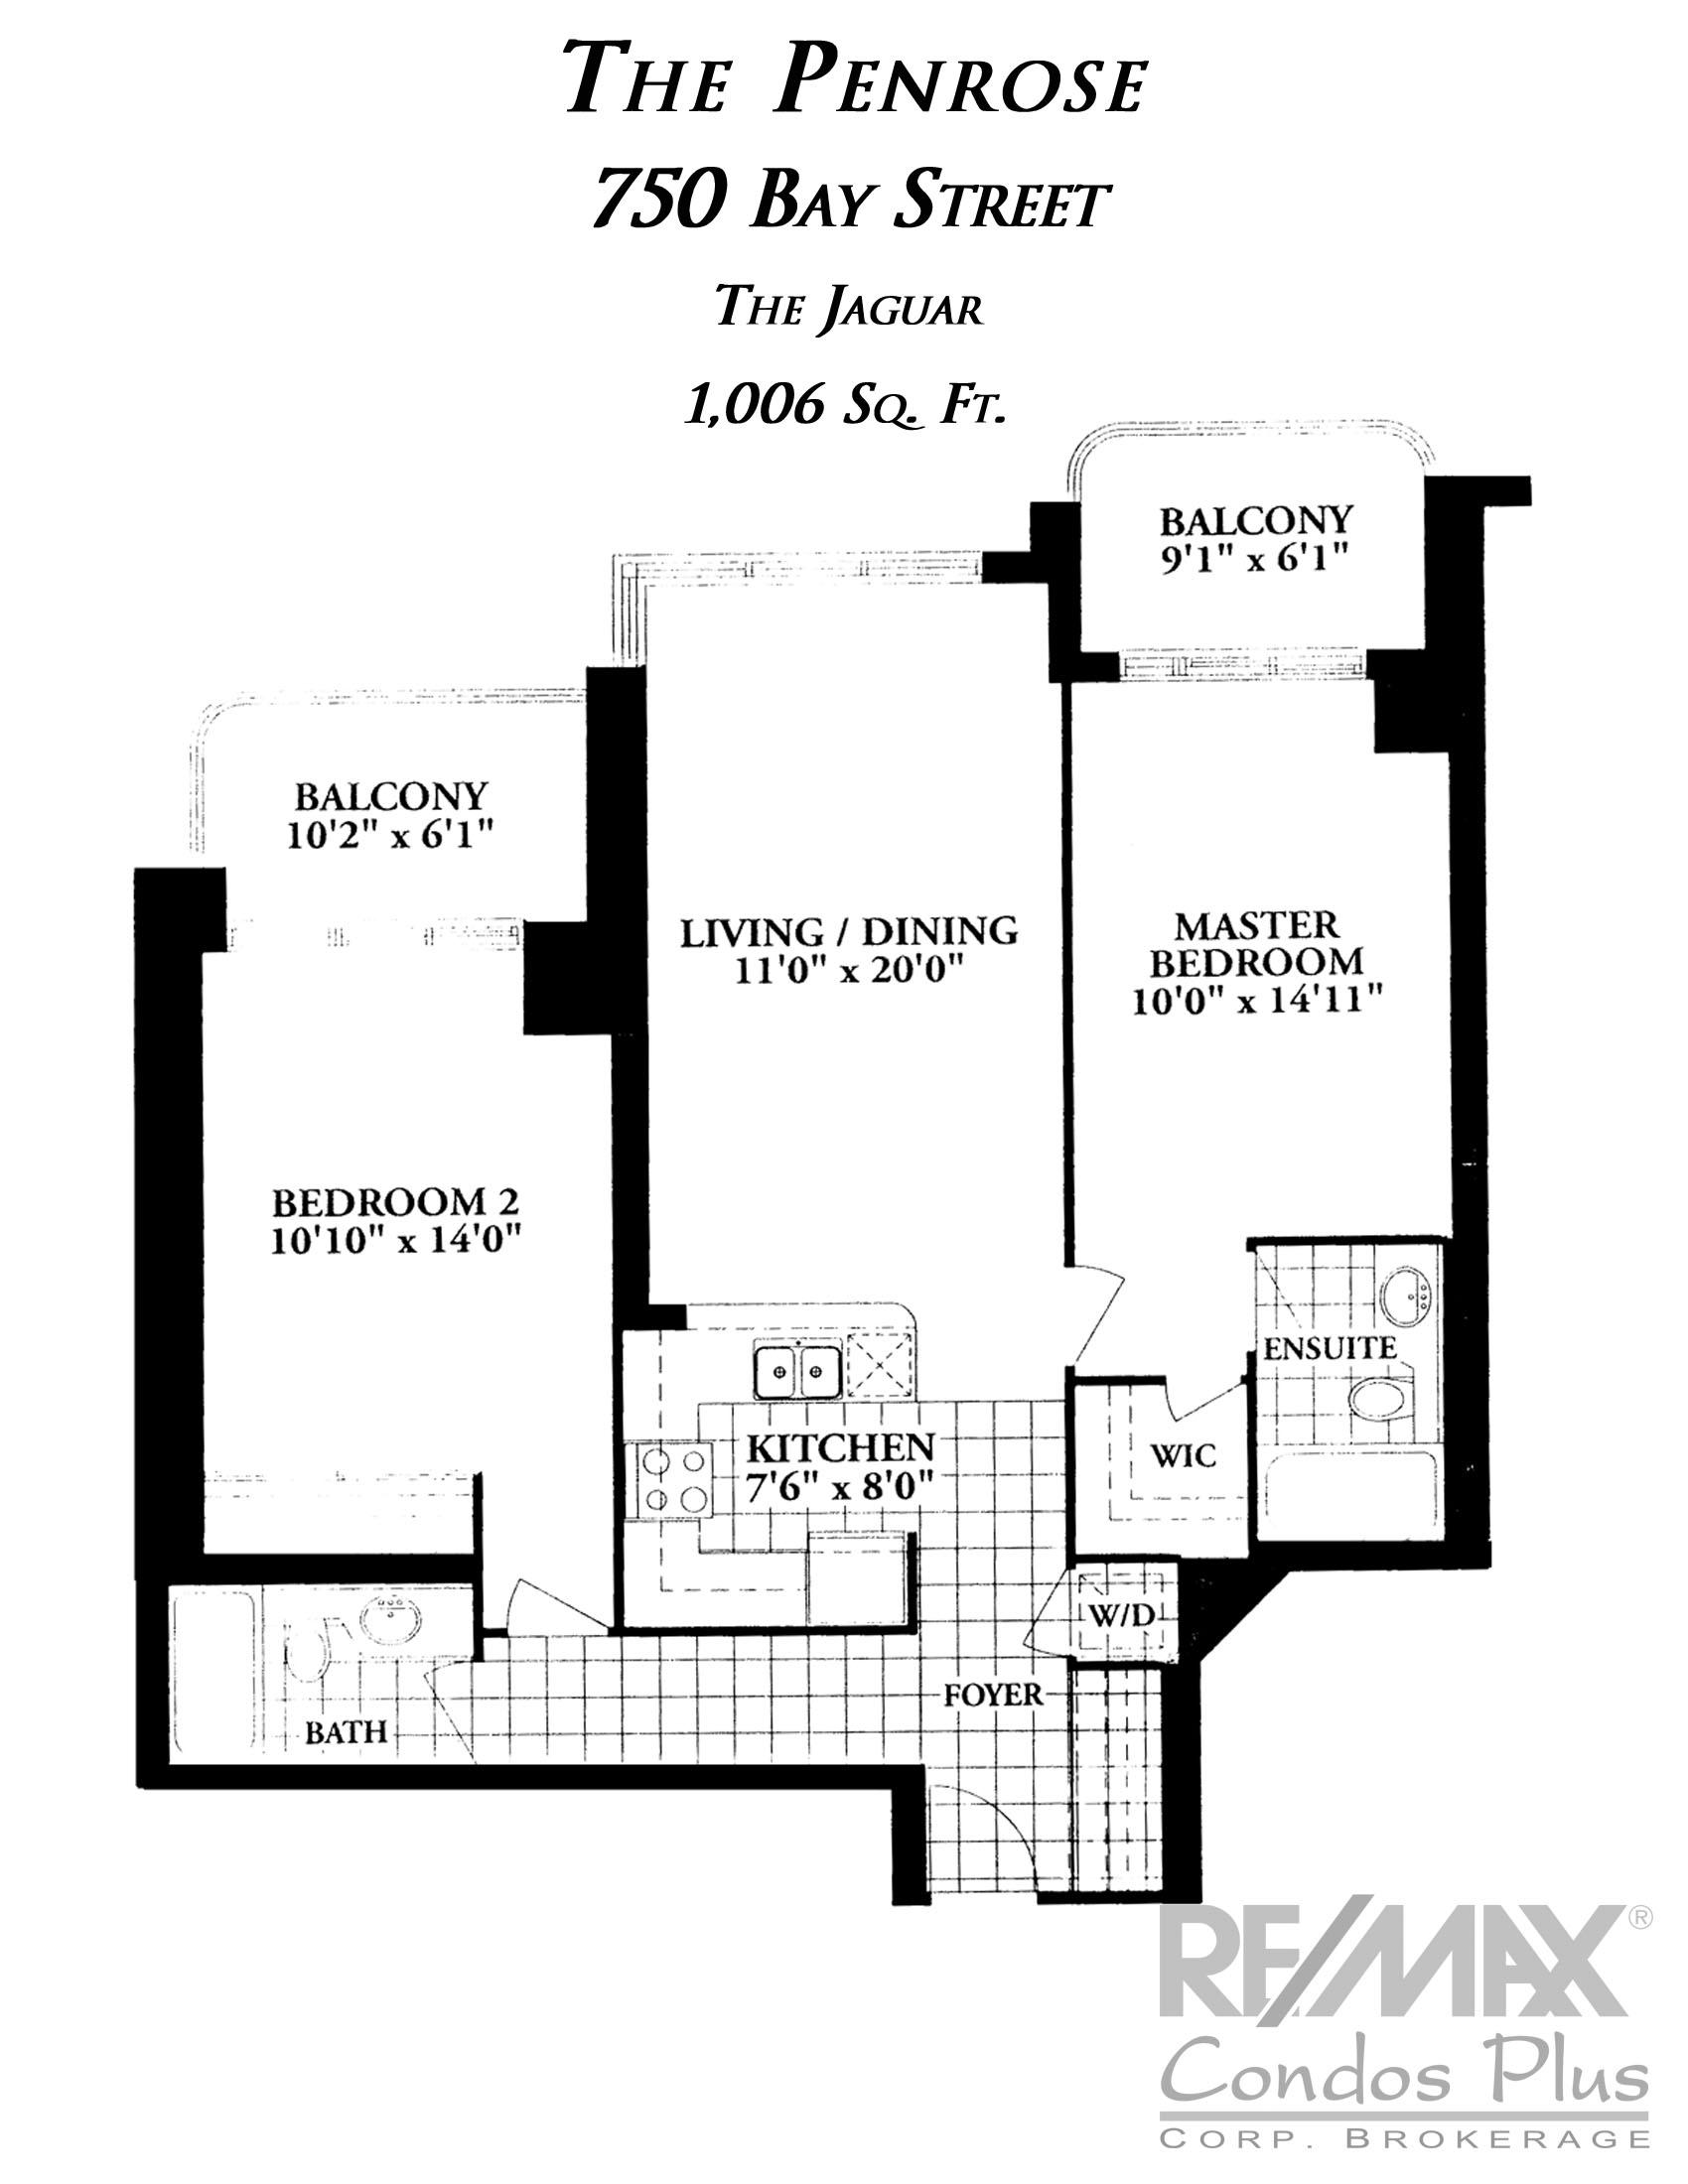 The Jaguar : 2 Bedroom , 1,006 SqFt